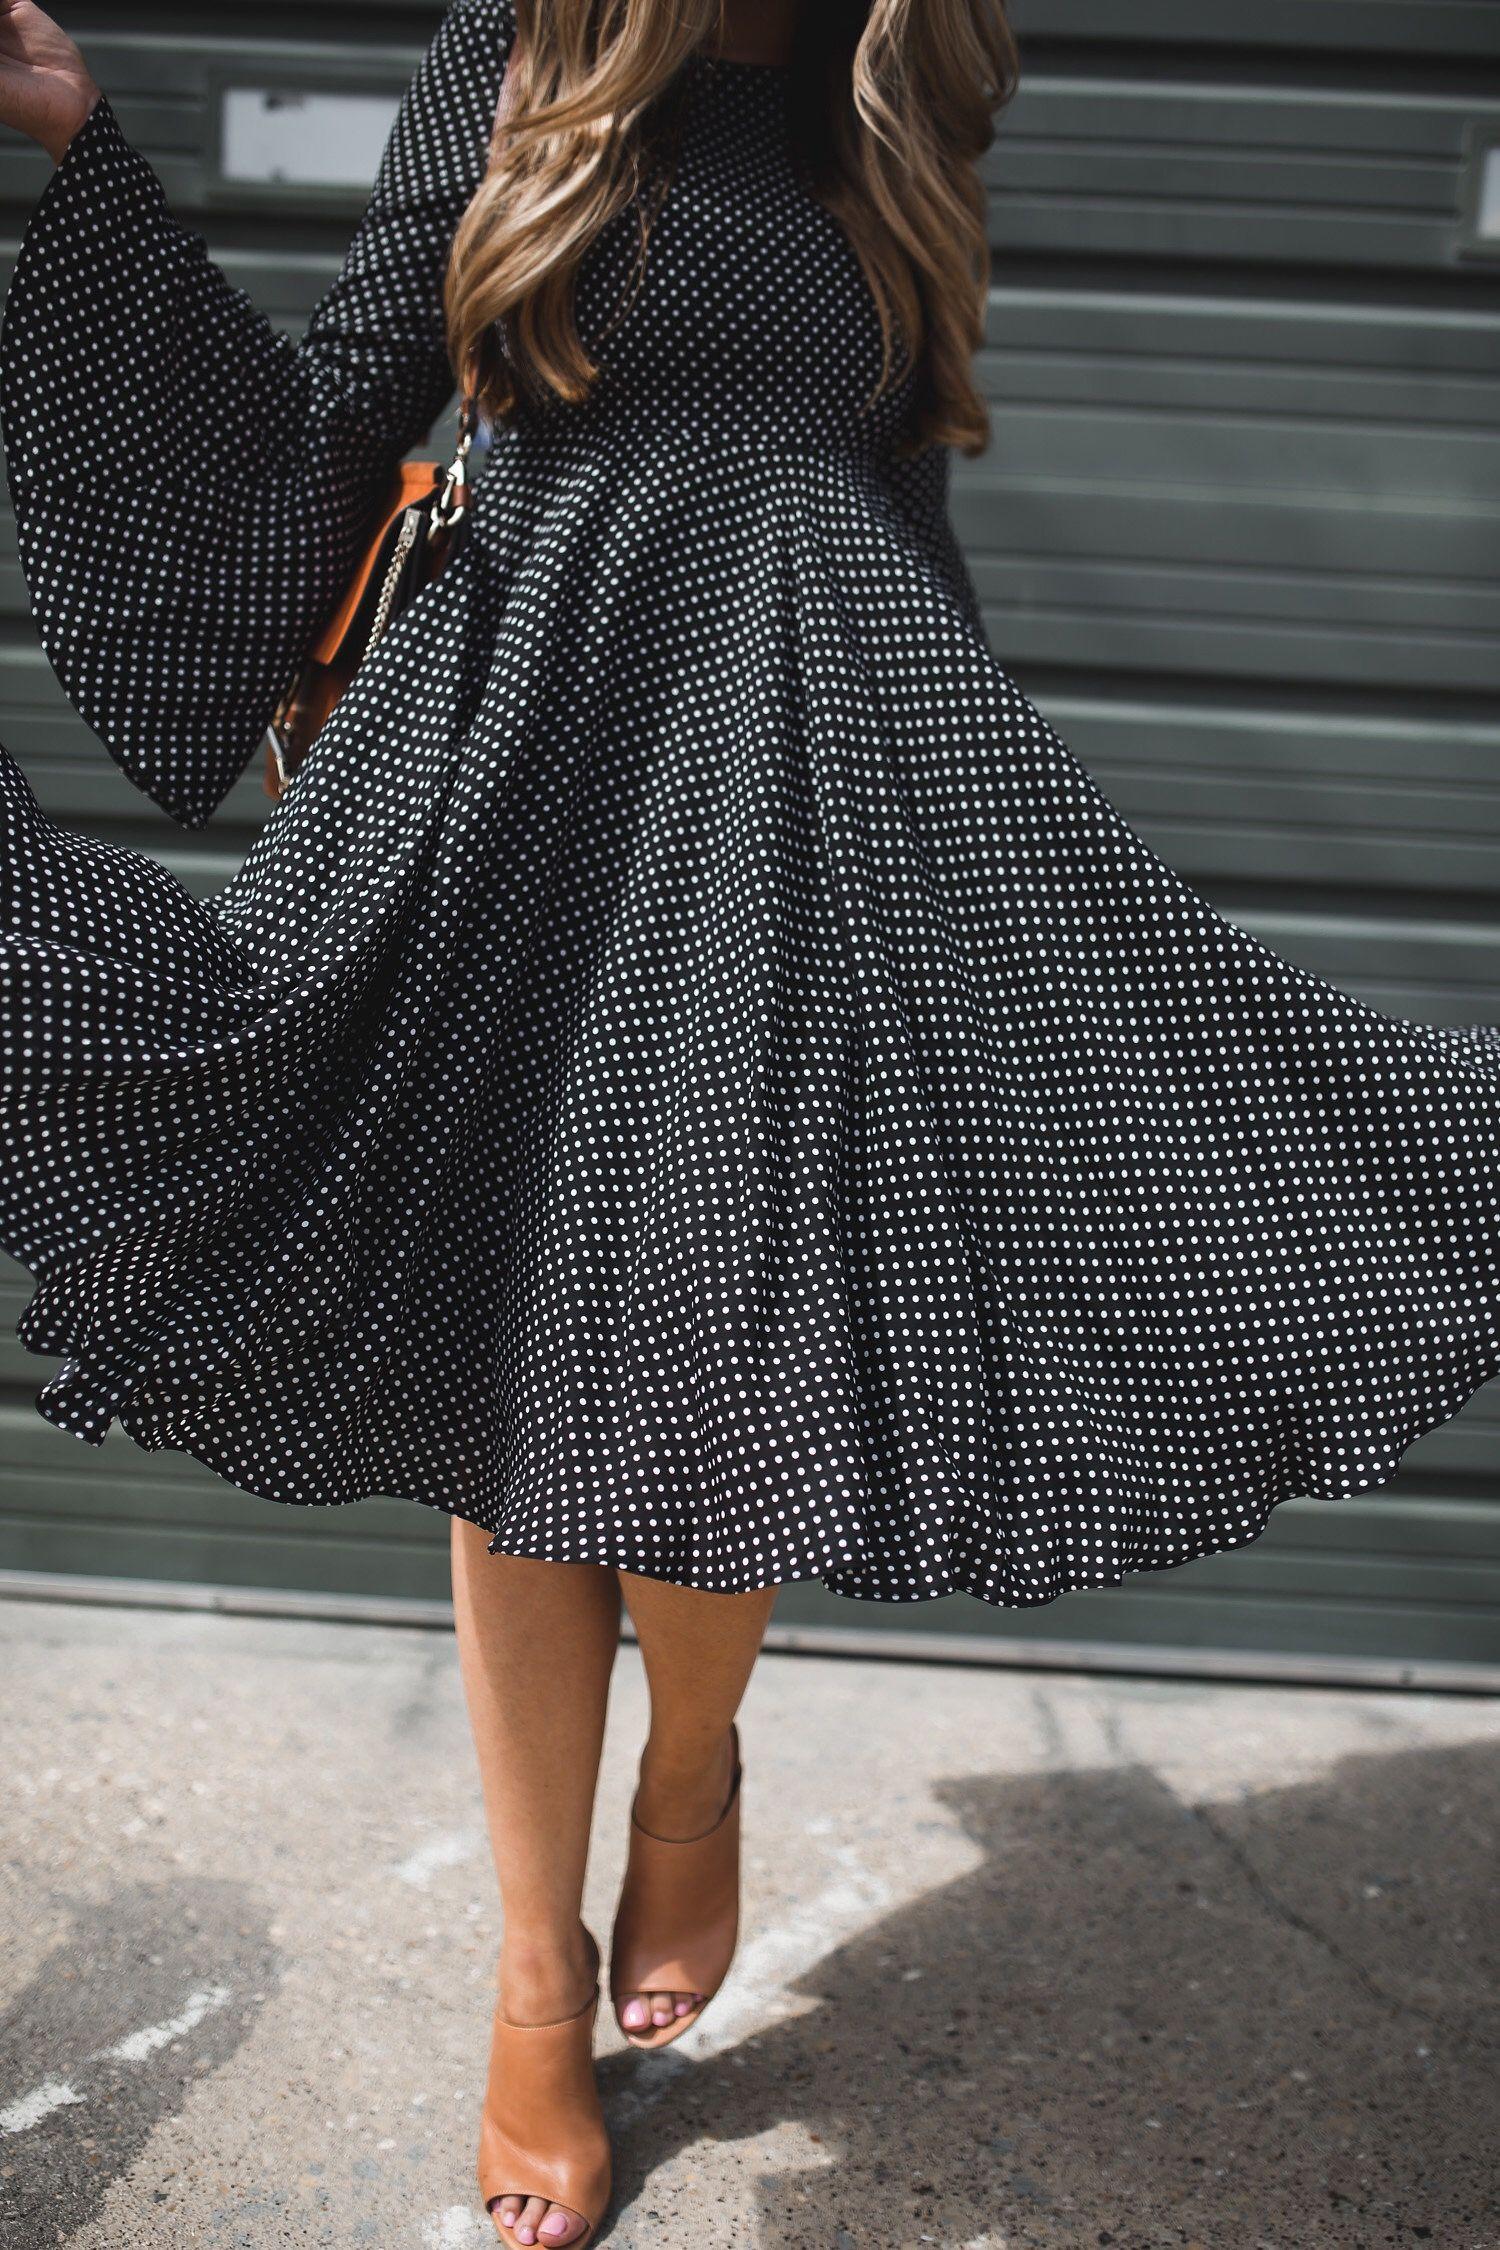 The Summer Work Dress The Teacher Diva A Dallas Fashion Blog Featuring Beauty Lifestyle Summer Work Dresses Dresses For Work Fashion [ 2250 x 1500 Pixel ]